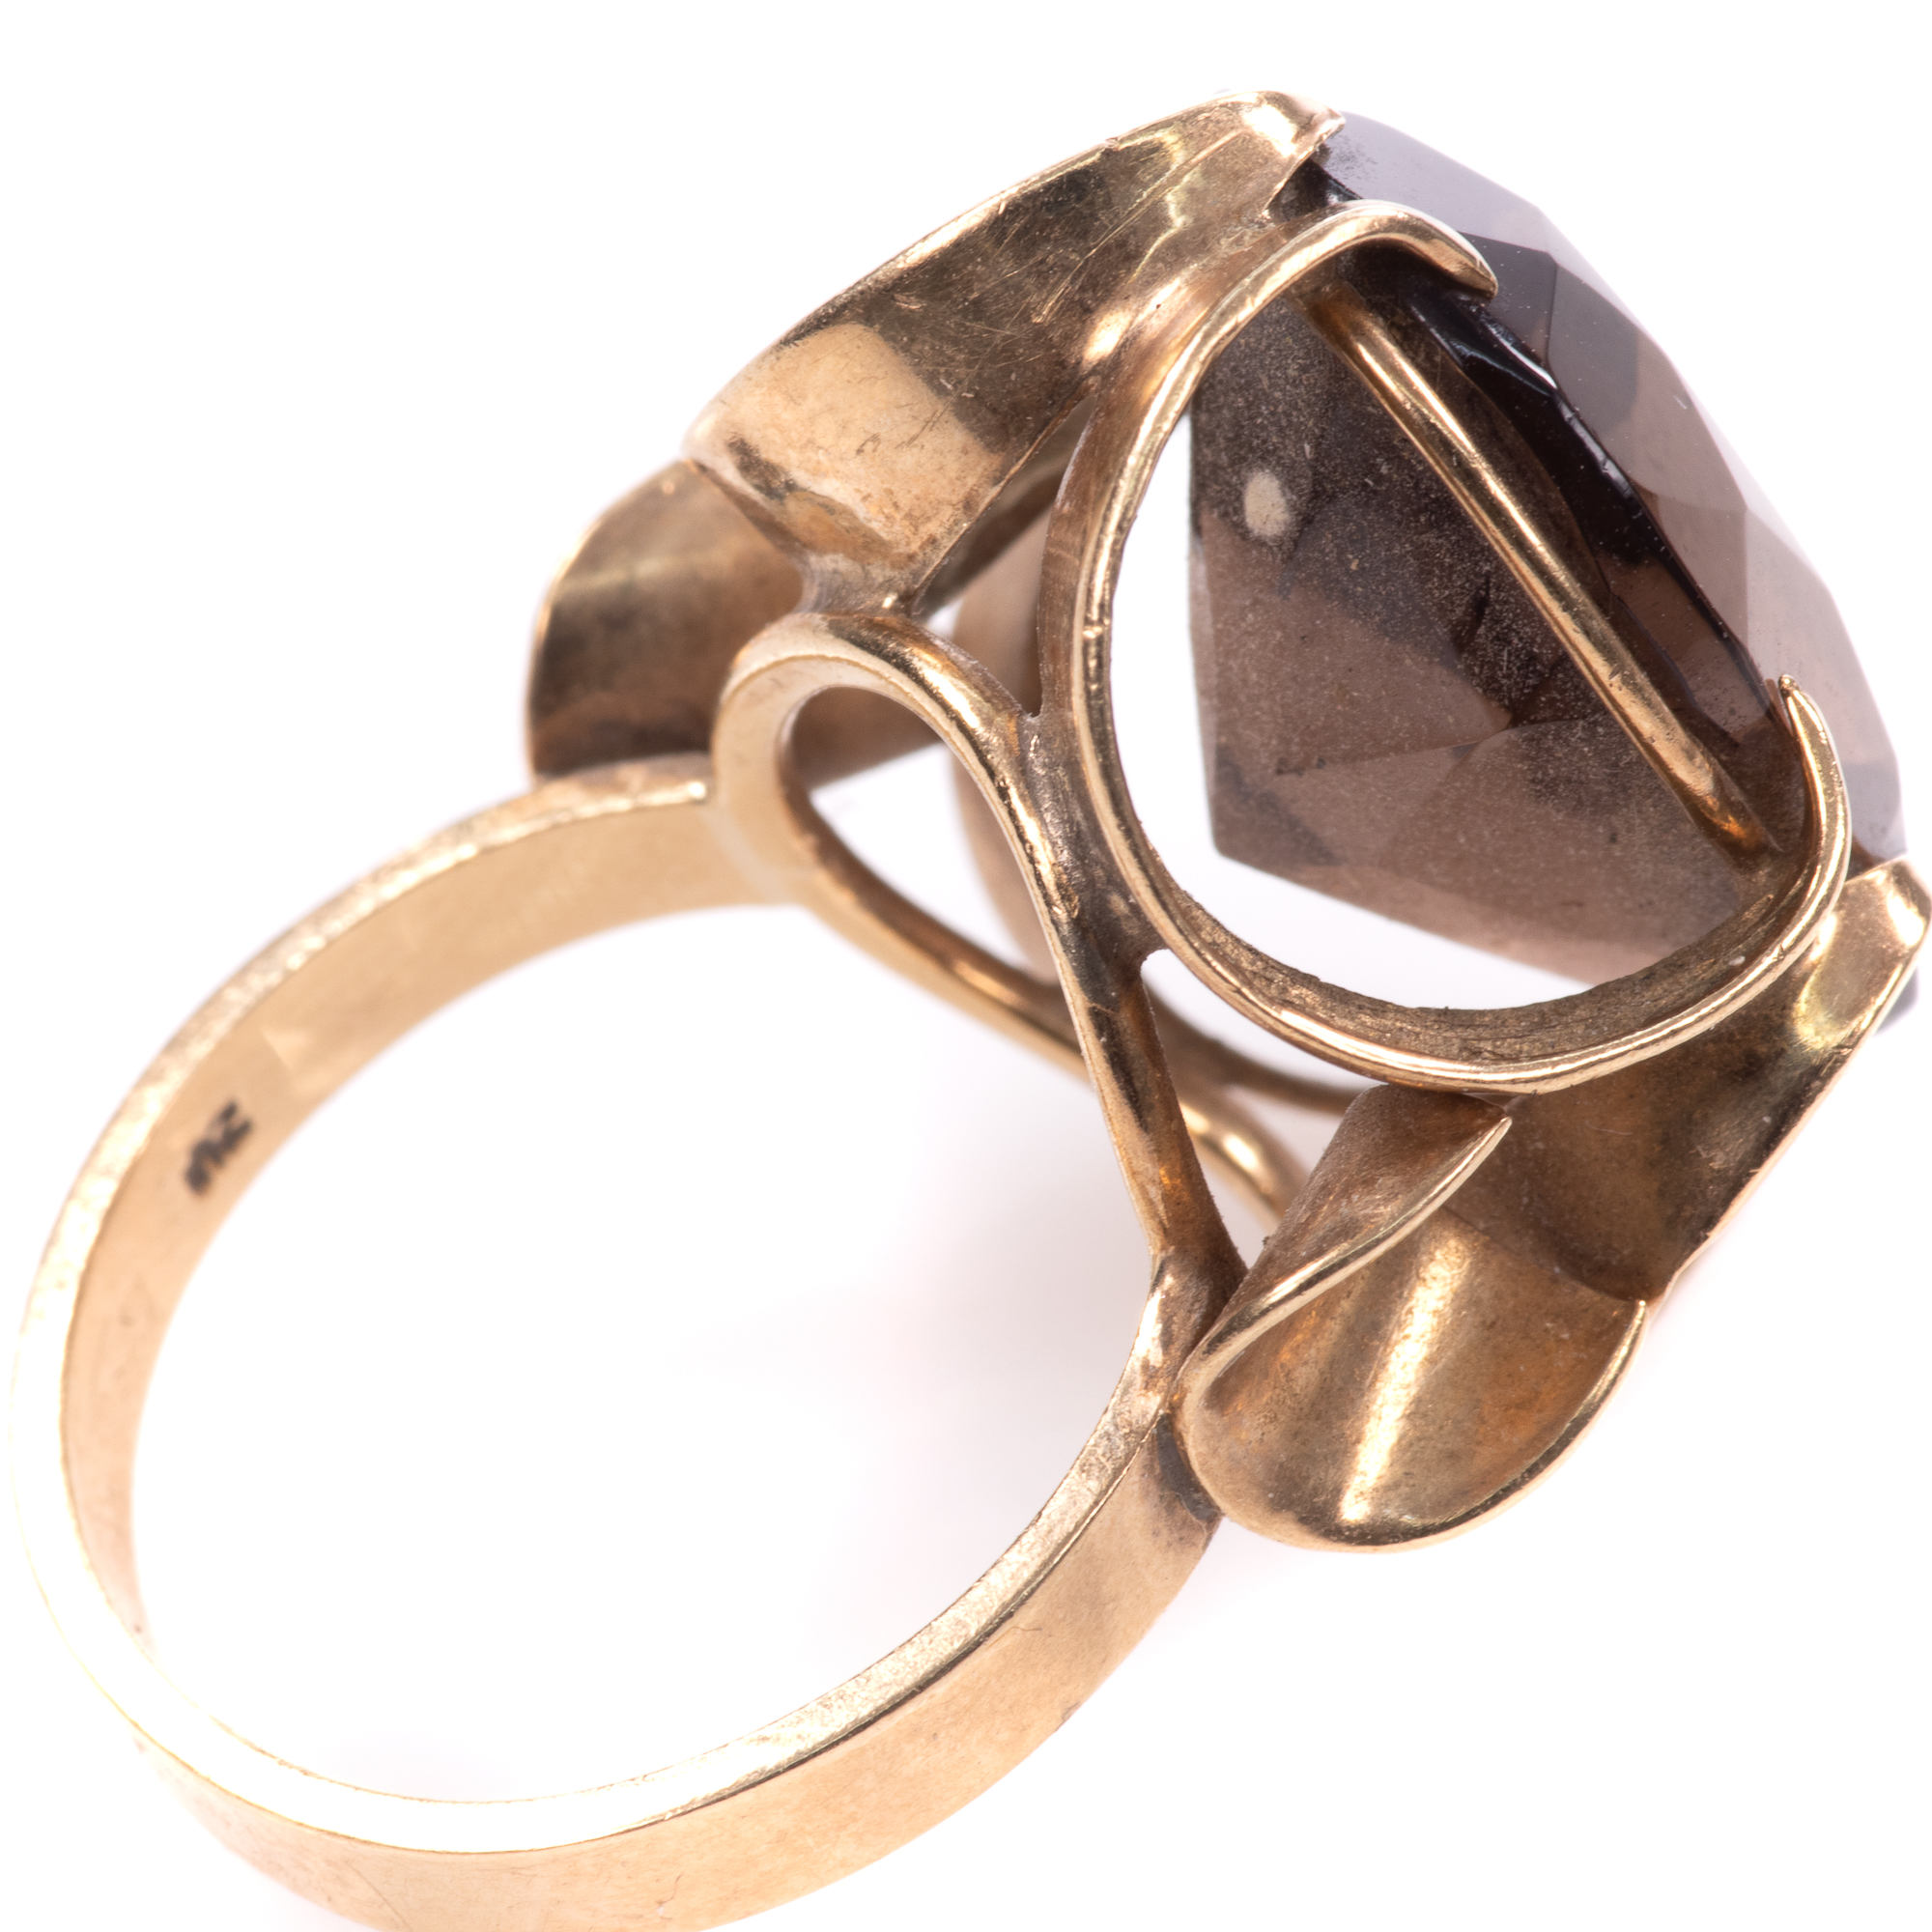 9ct Gold 12.75ct Smoky Quartz Ring - Image 5 of 7